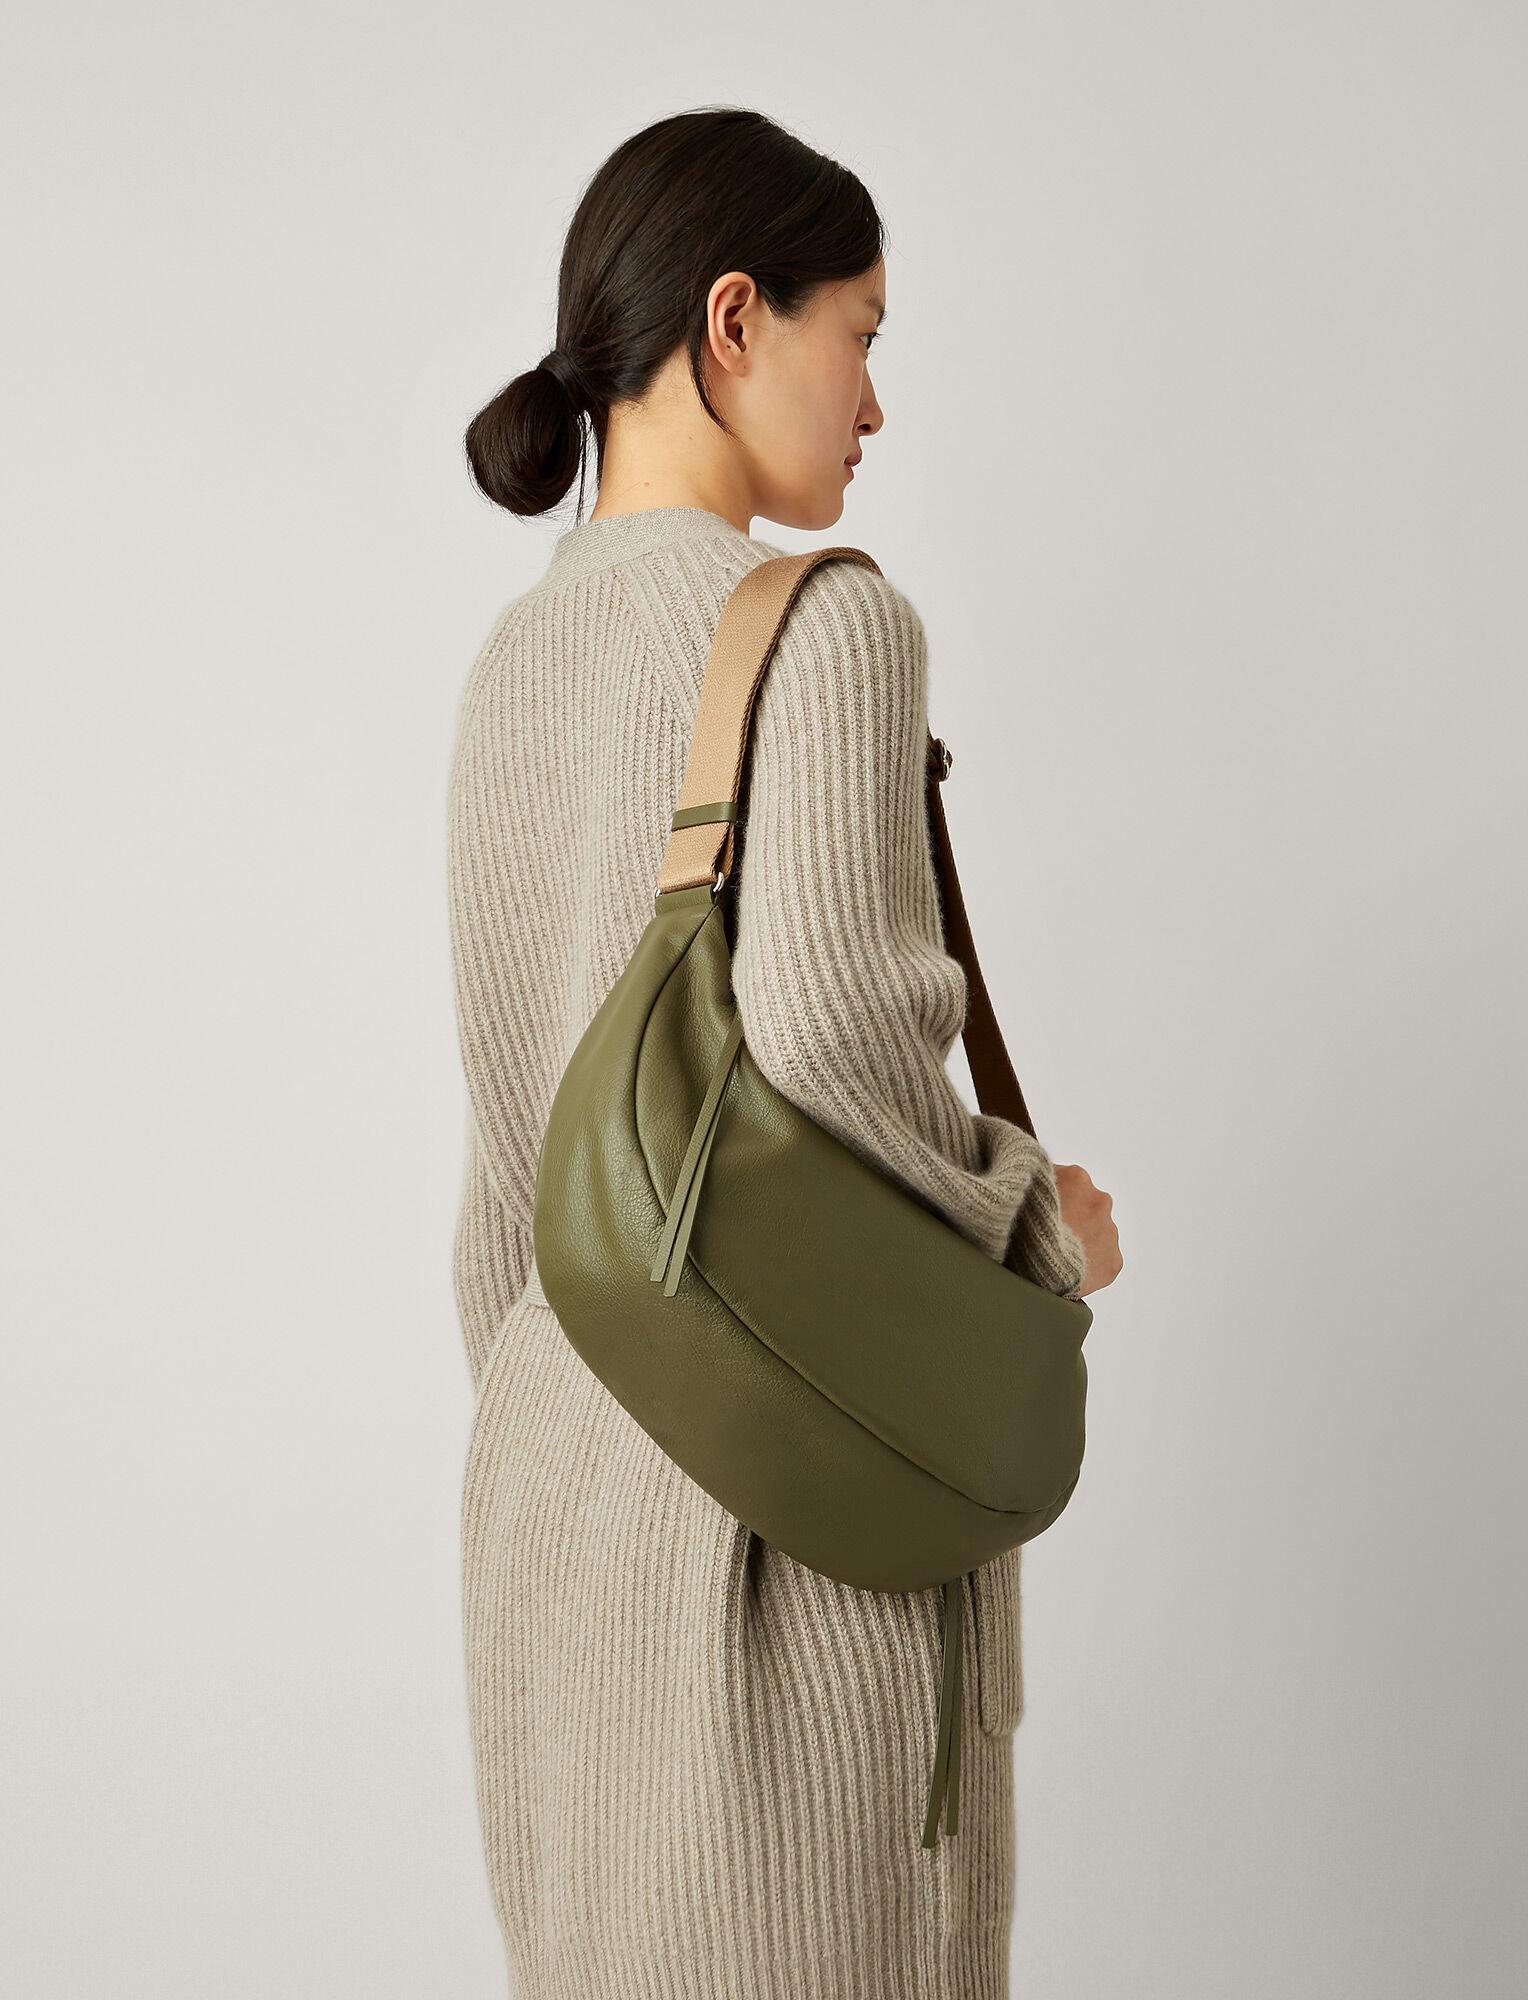 Joseph, Marylebone Leather Bag, in OLIVE